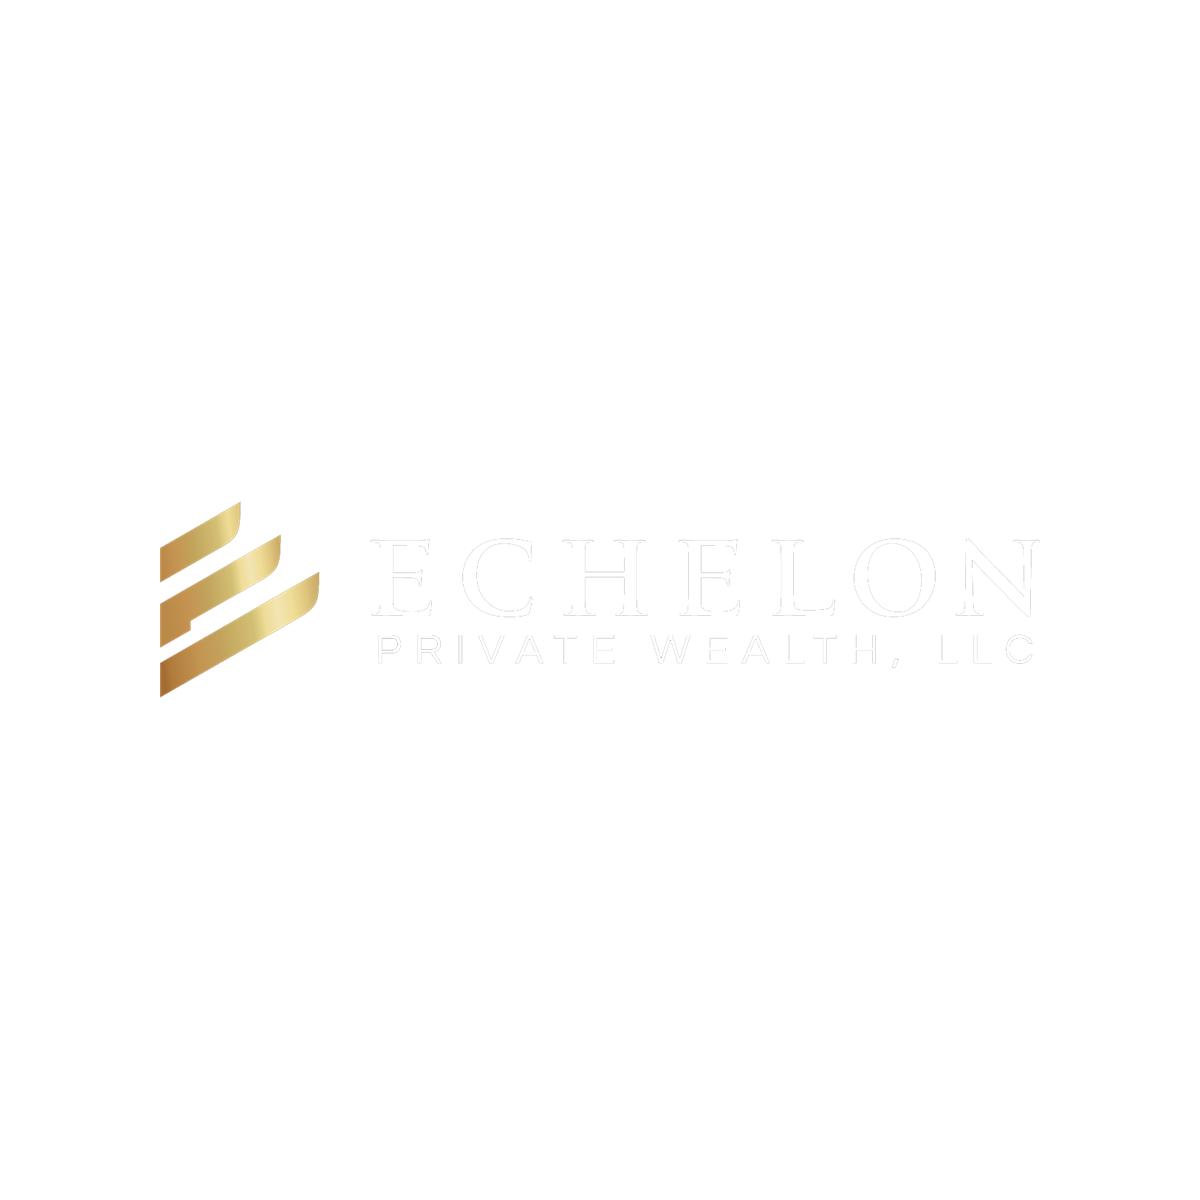 Echelon Private Wealth, LLC